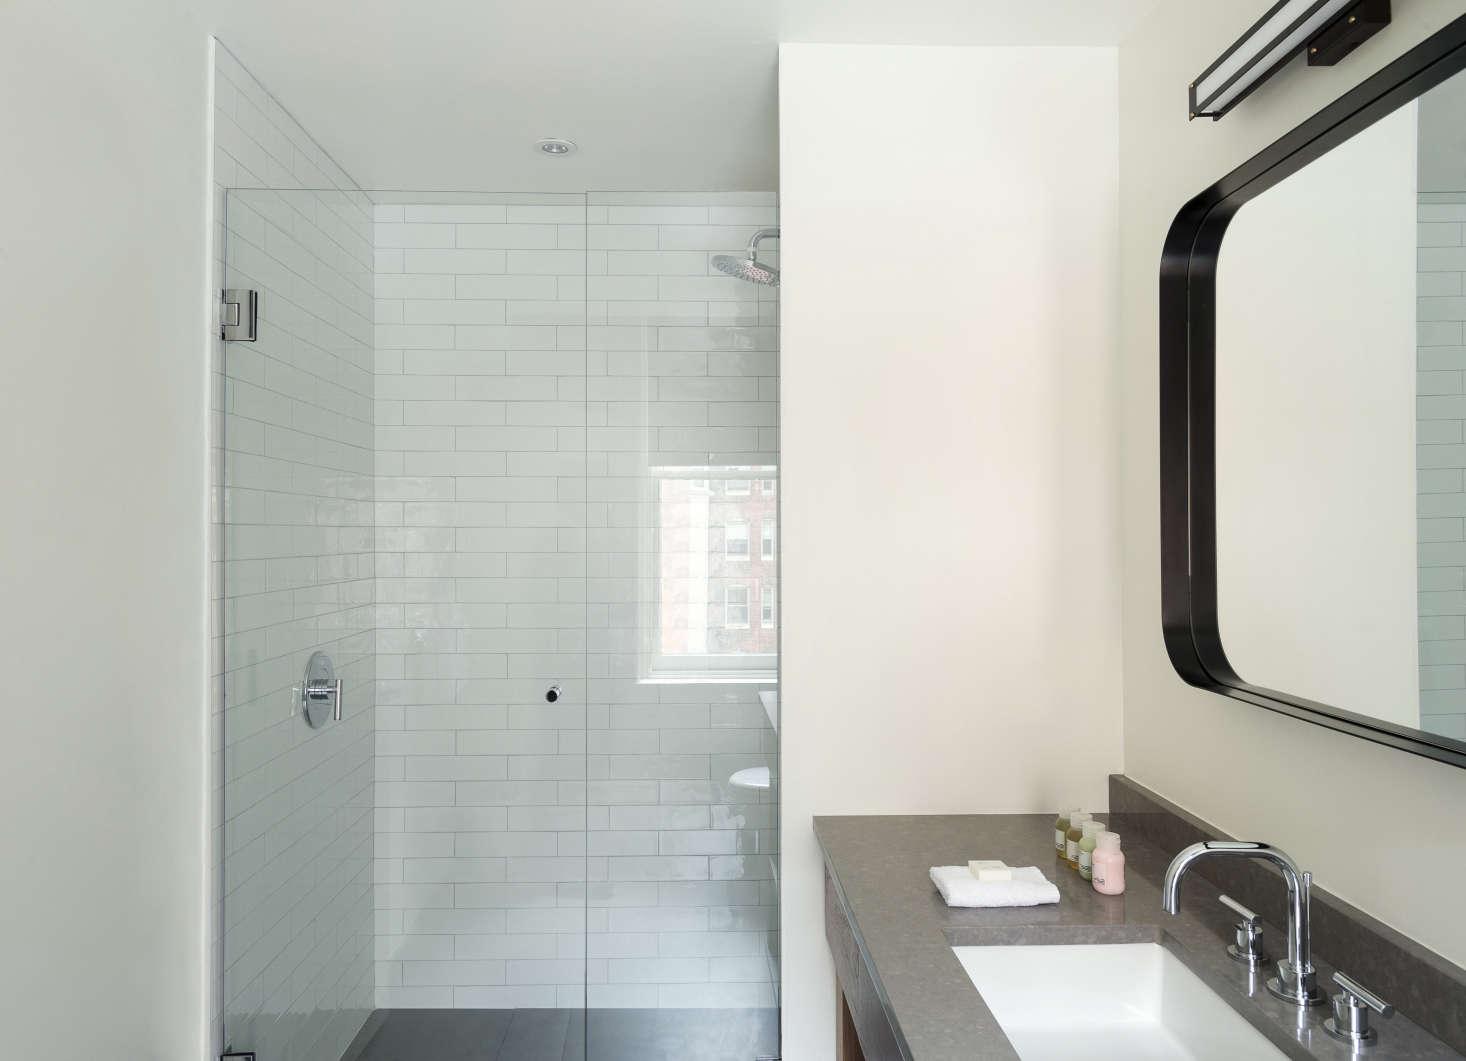 Roost-Rittenhouse-Philadelphia-Morris-Adjmi-Architects-Roost-photo-Remodelista-4A